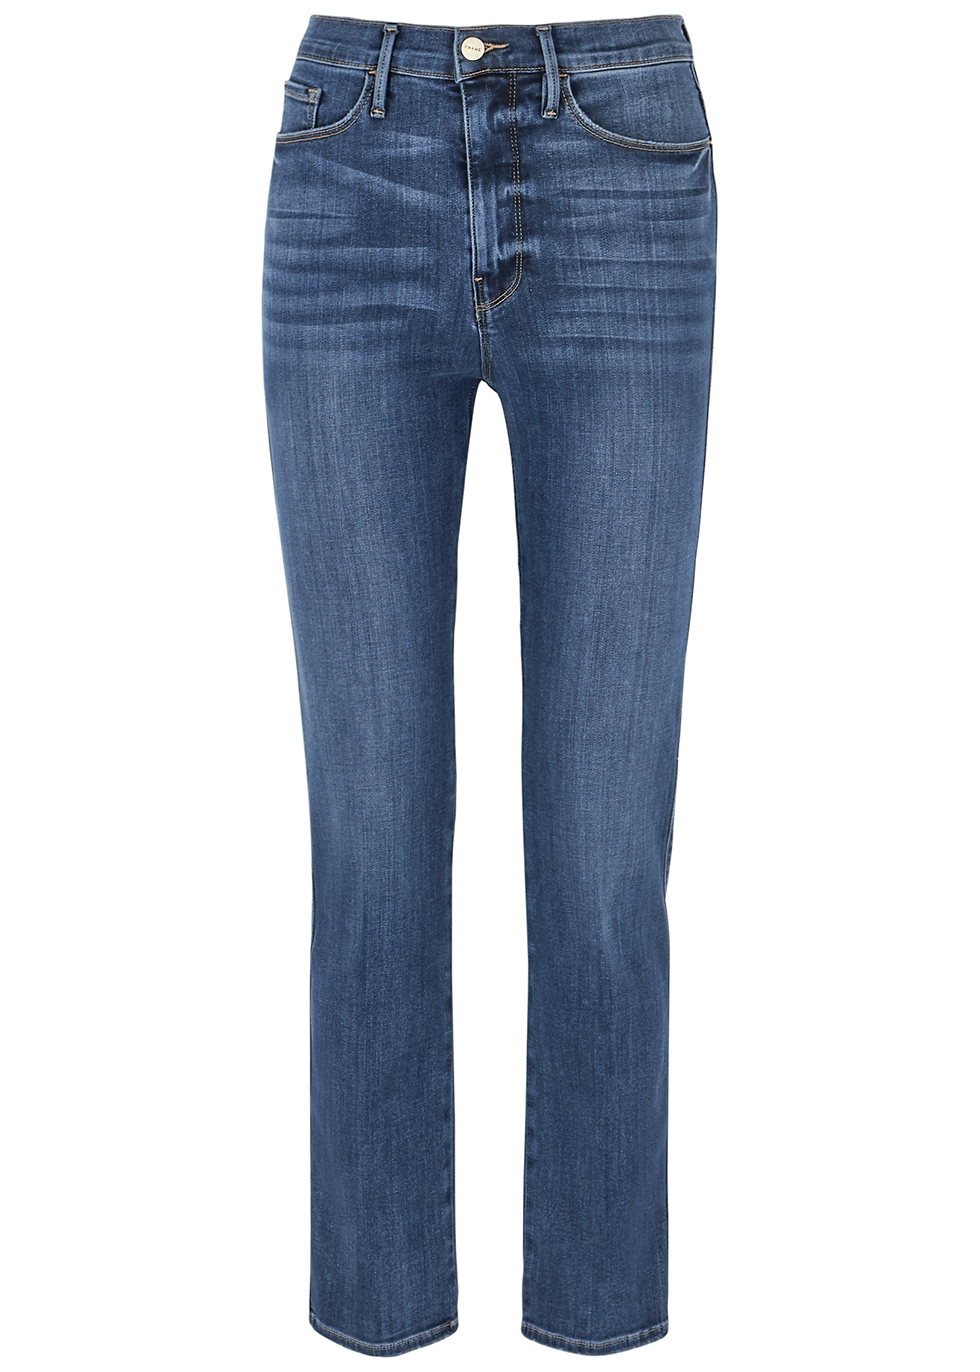 Le Sylvie Slender blue straight-leg jeans